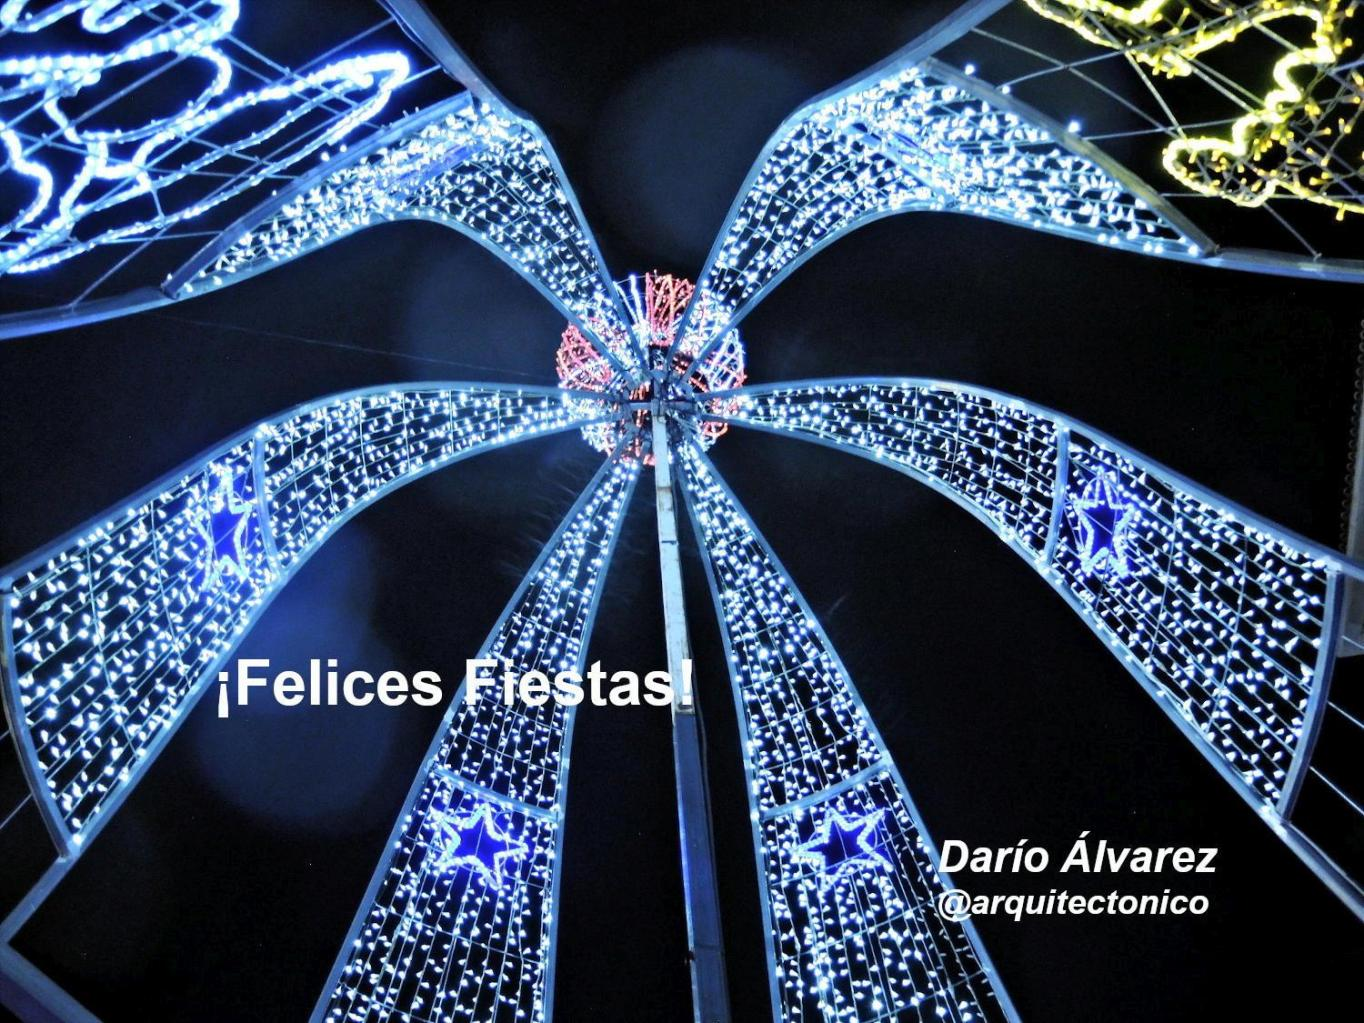 ¡Felices Fiestas! 2019 - 2020  Darío Álvarez @arquitectonico